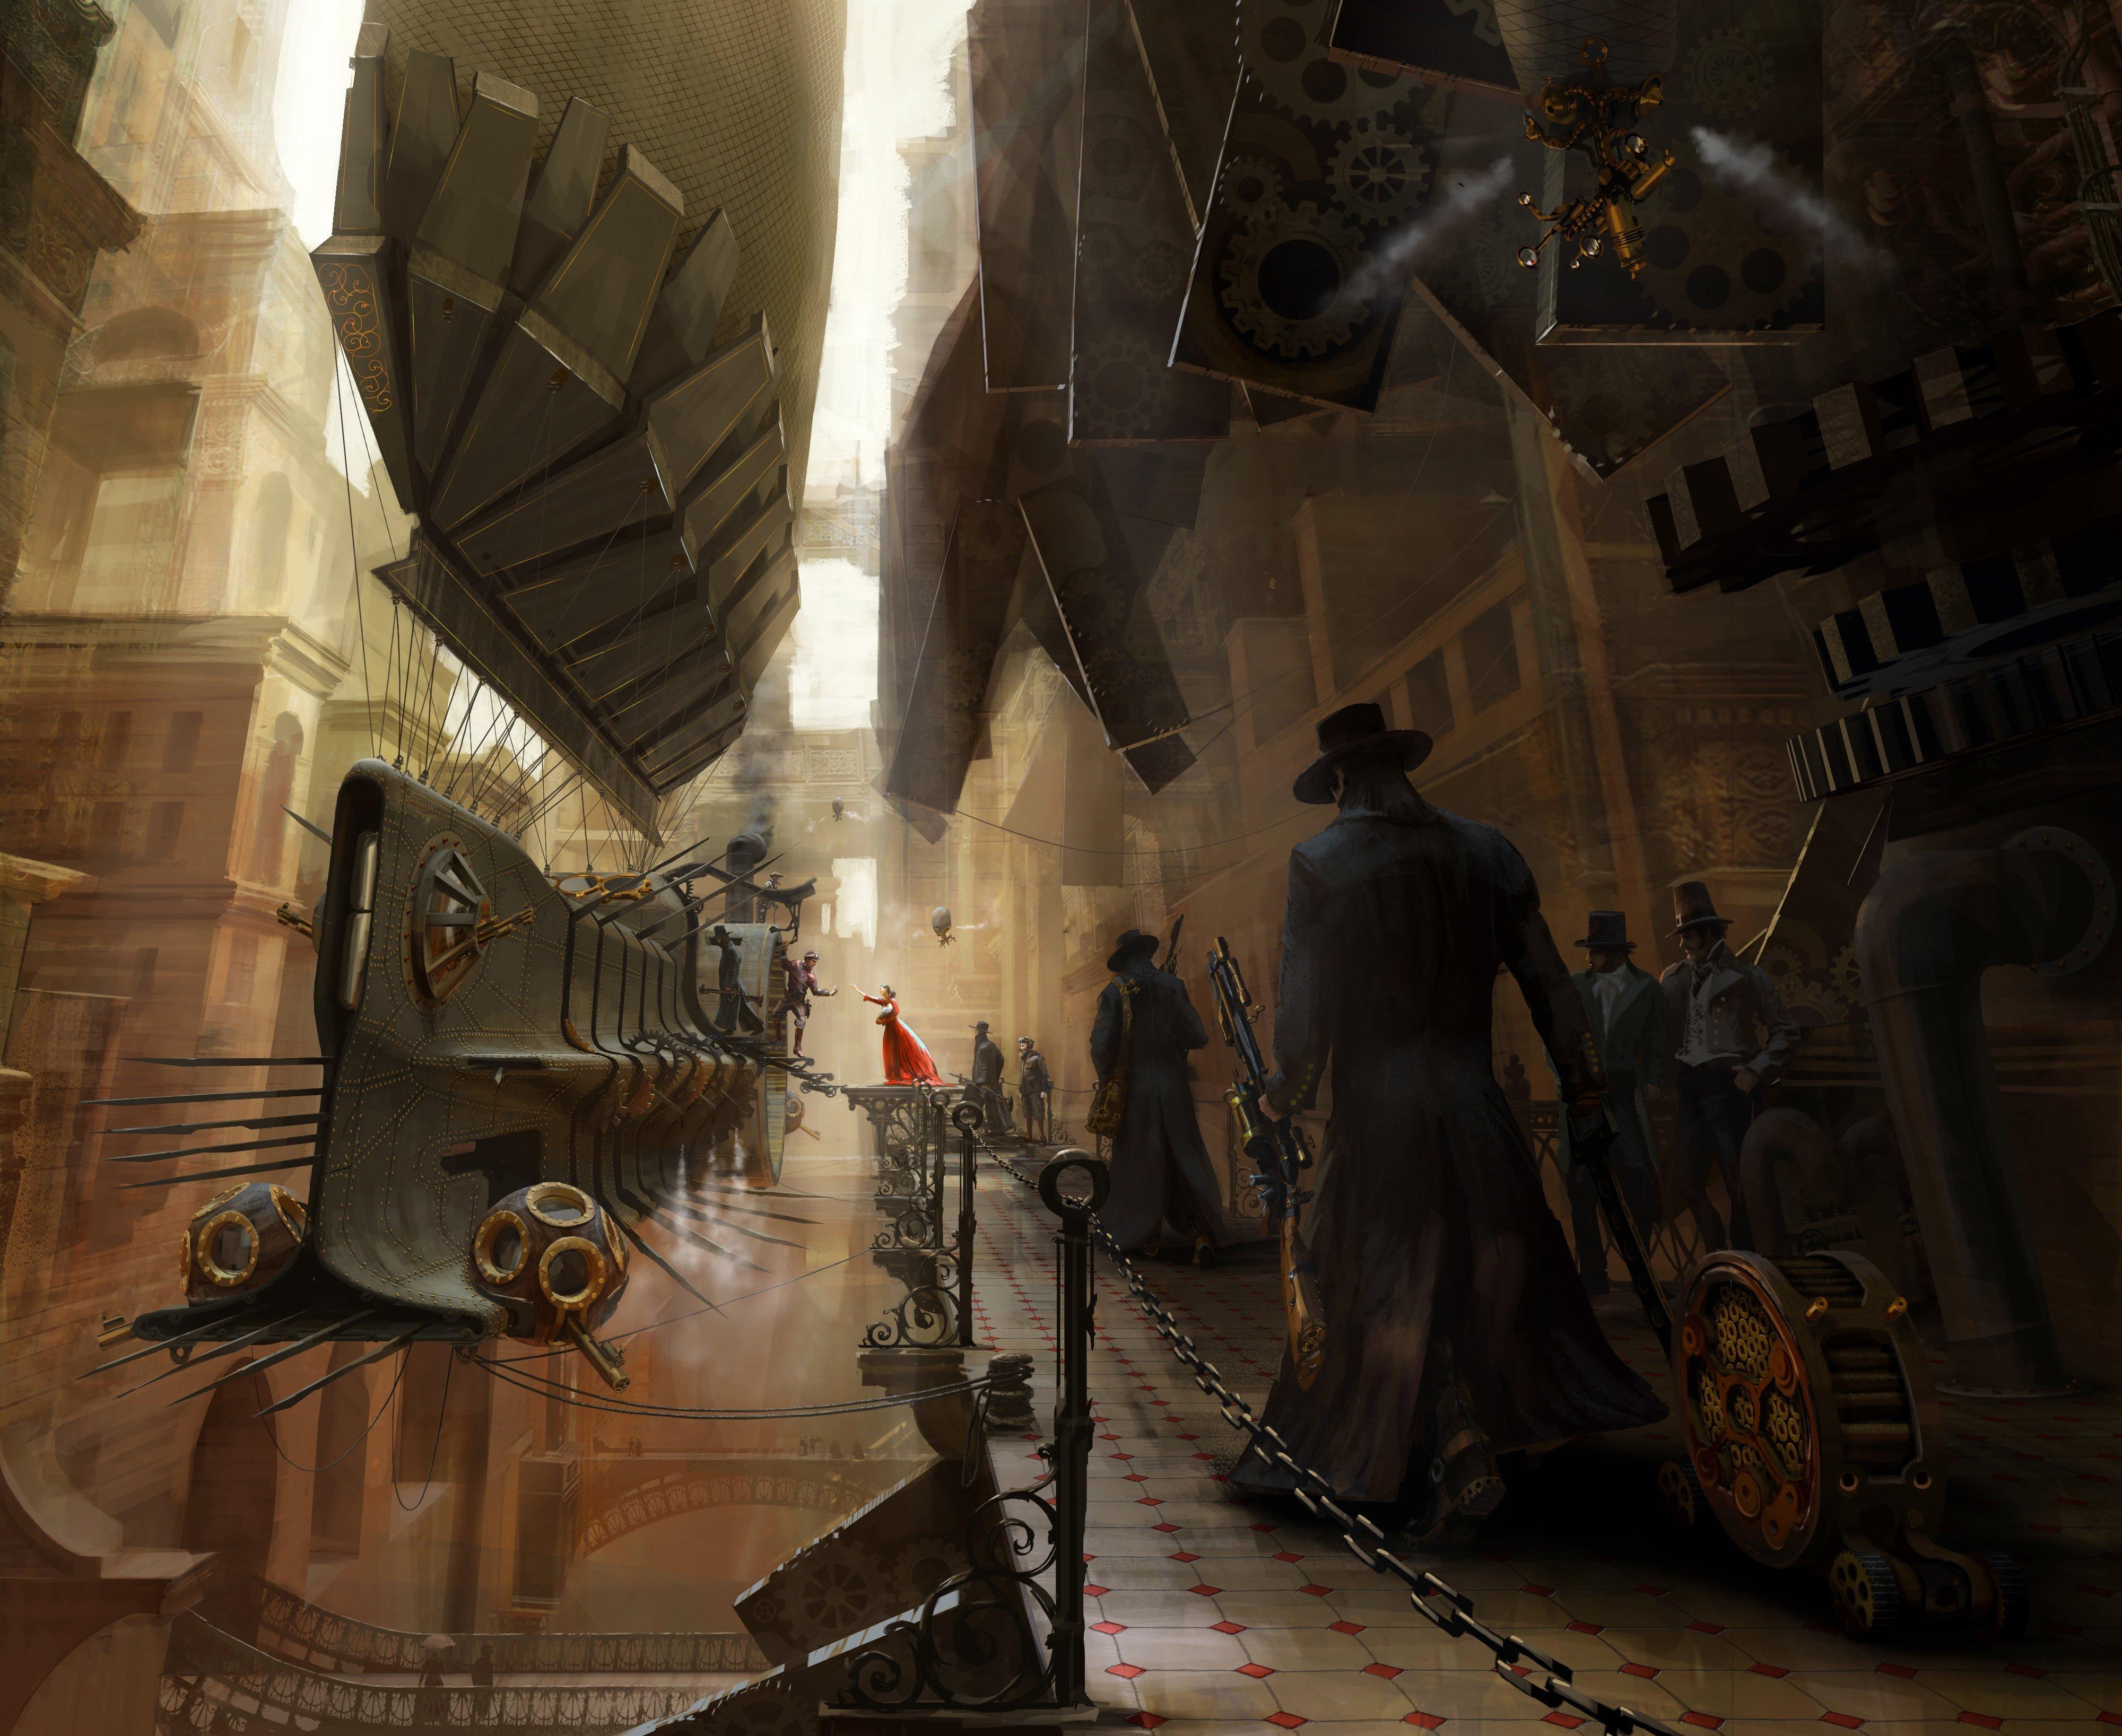 Wallpaper drawing steampunk airship wallpapers fantasy   download 4000x3273